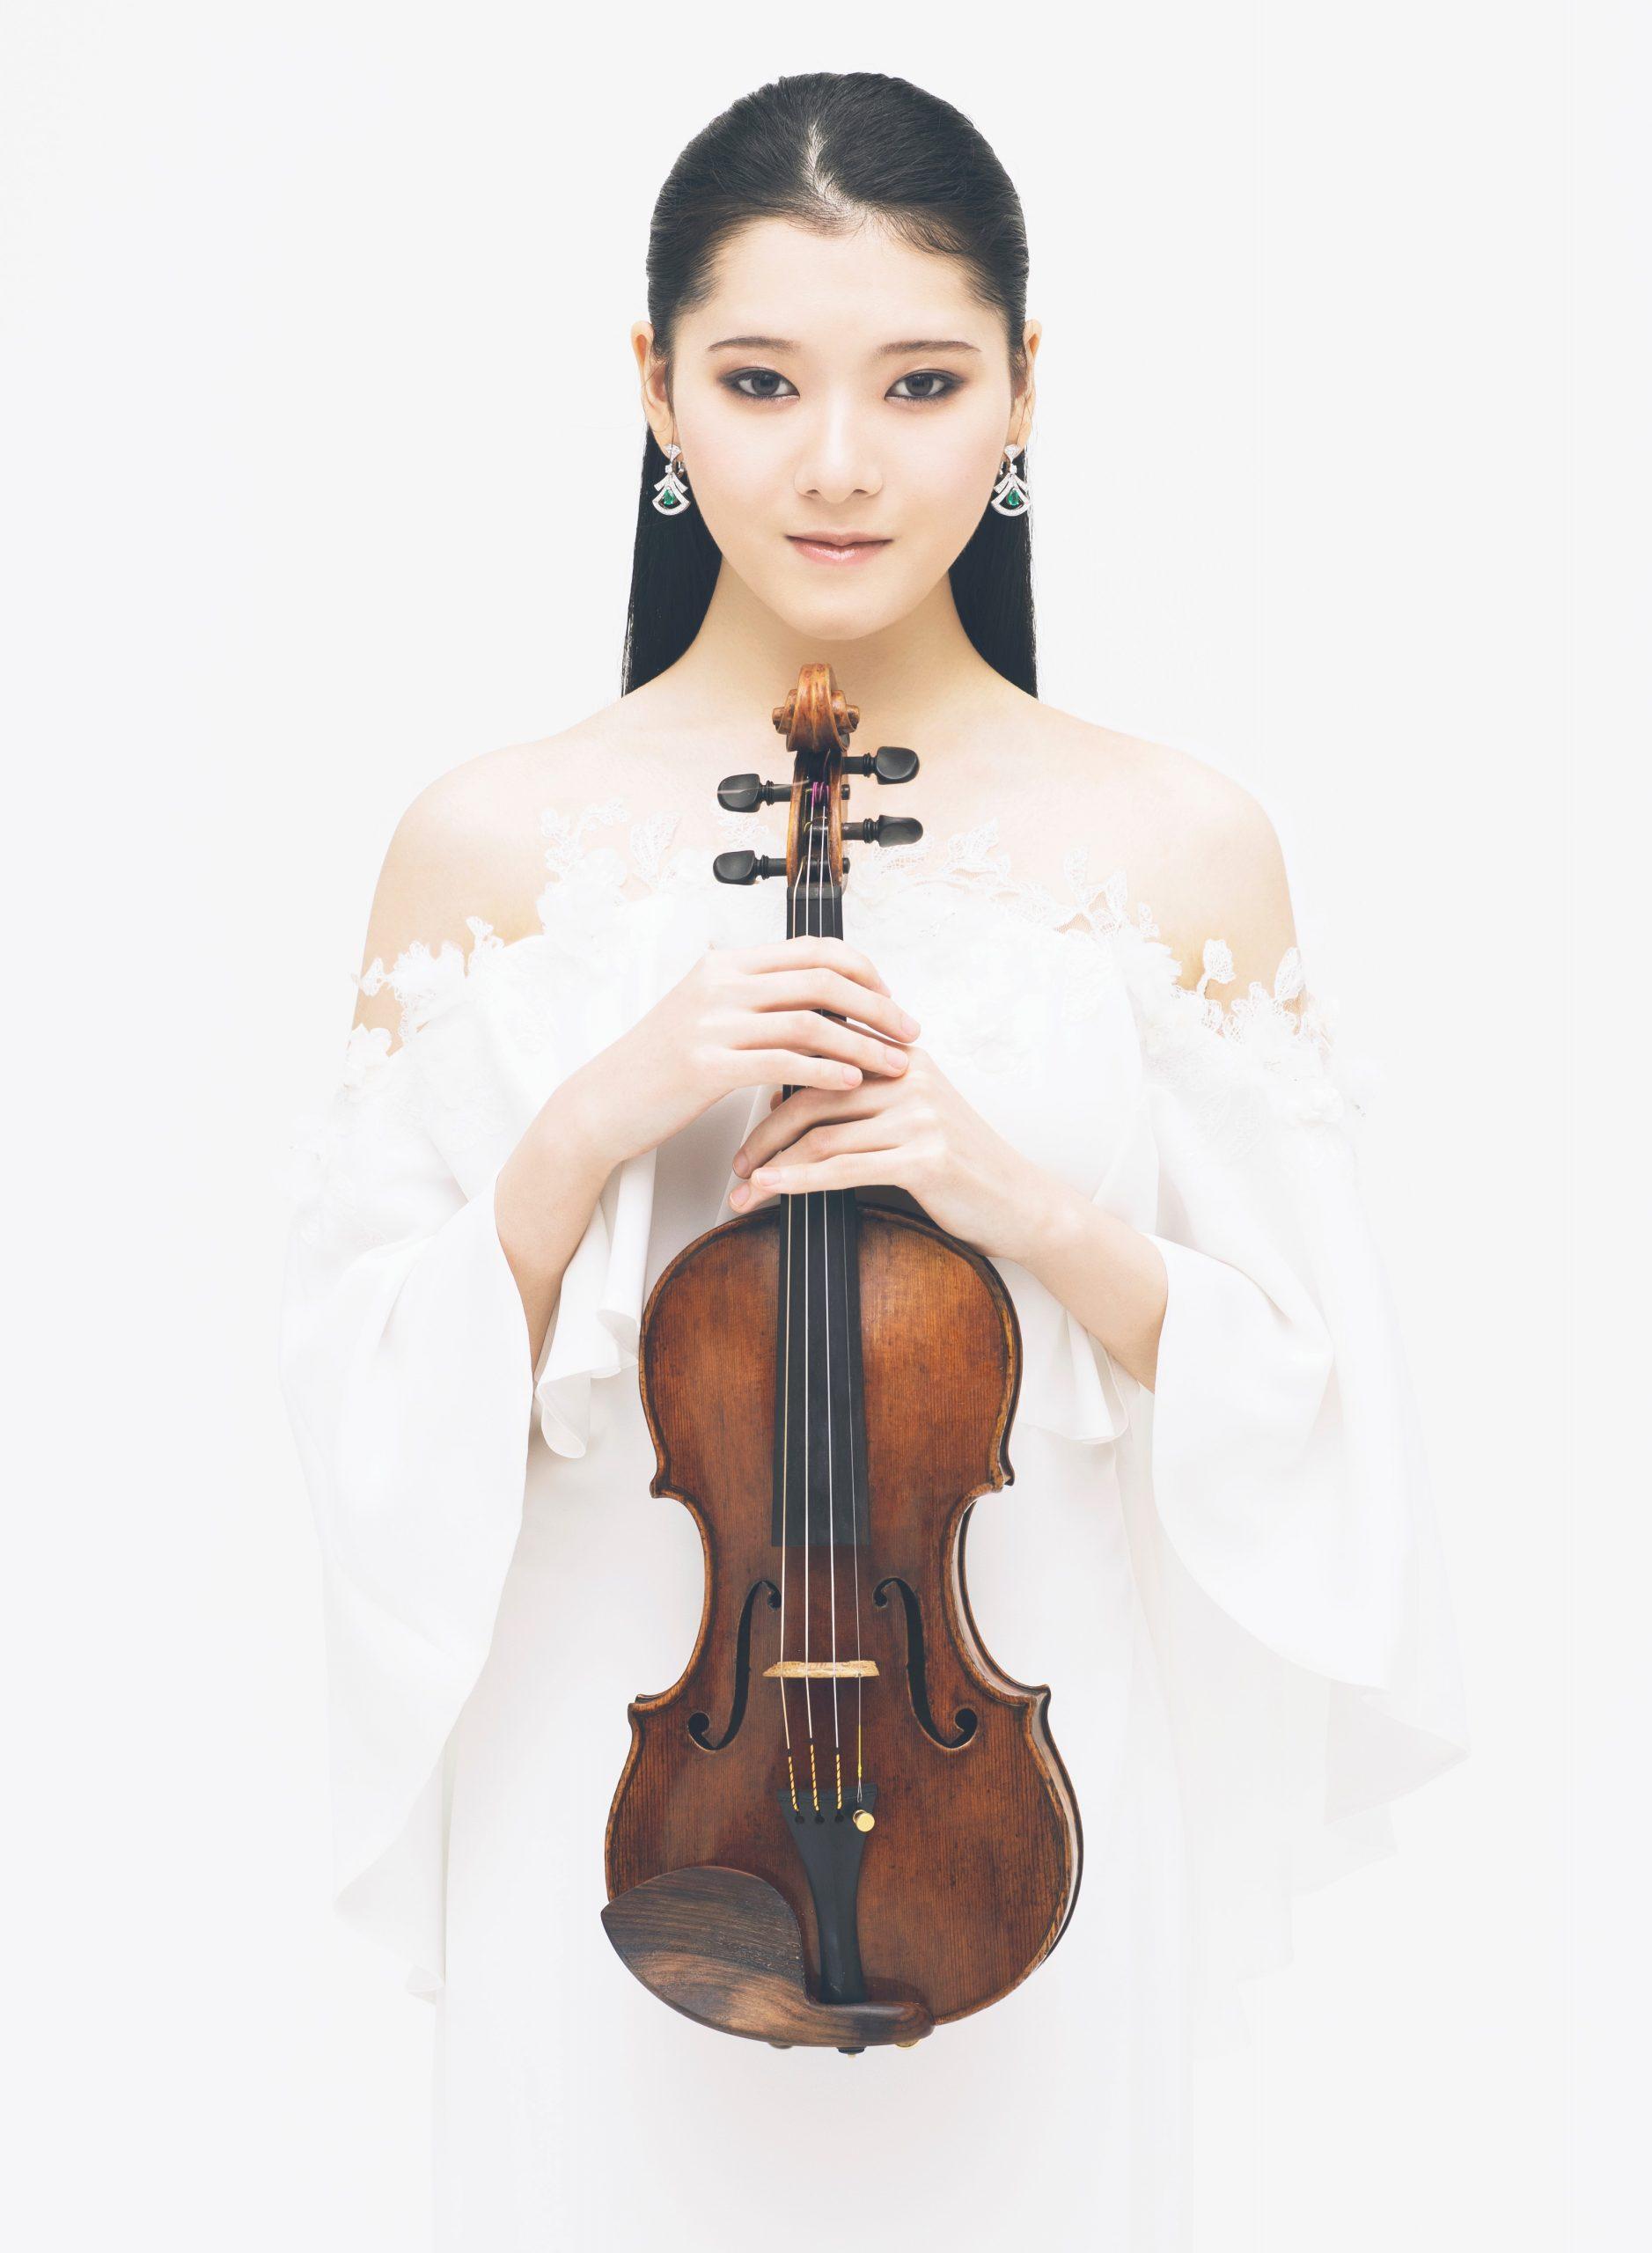 Moné Hattori performs in Japan